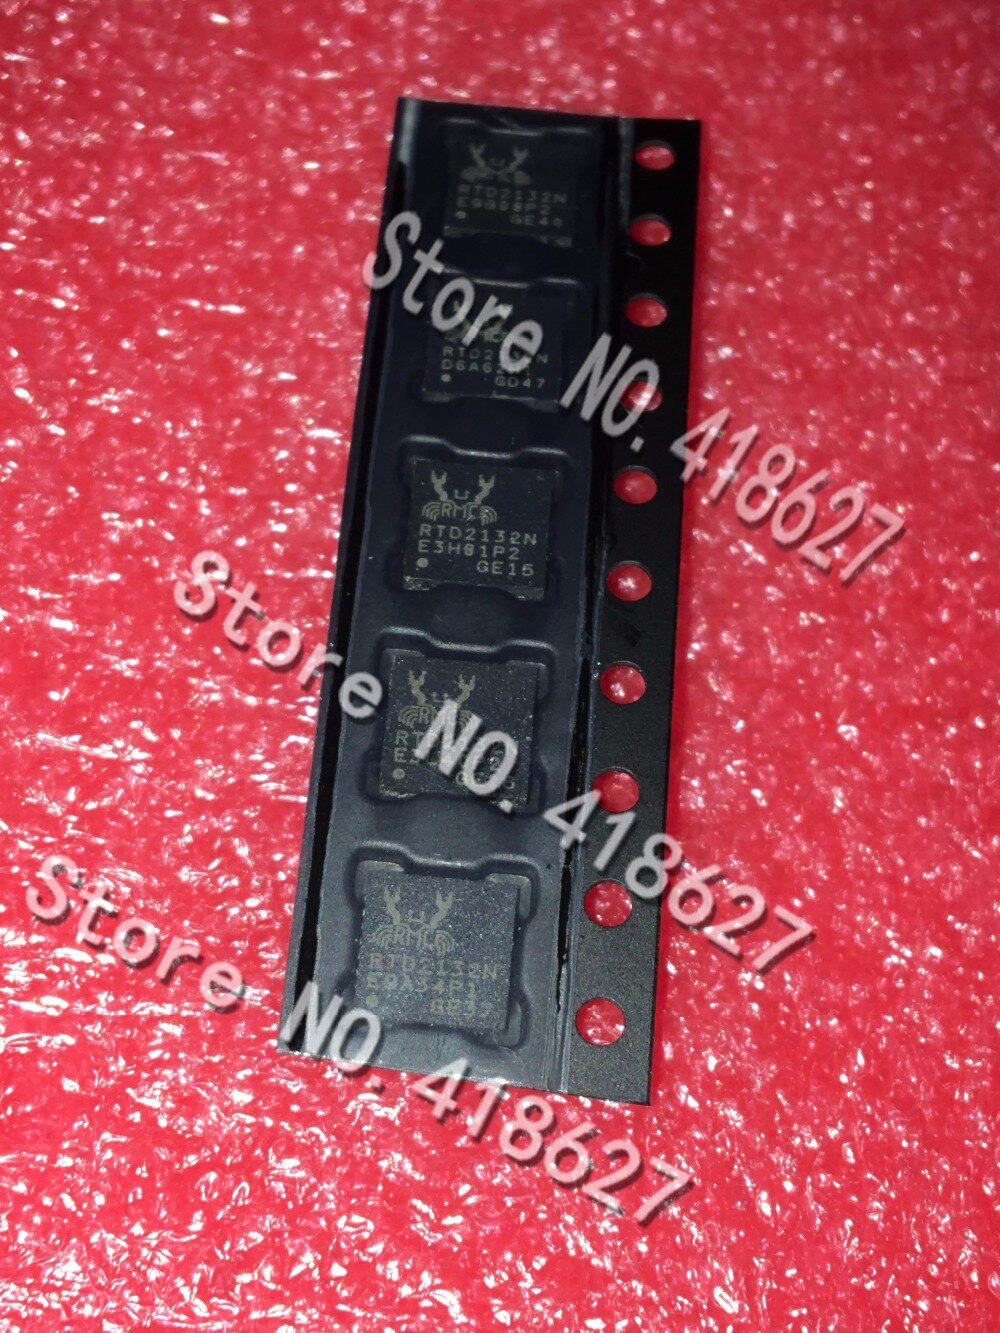 5 unids/lote RTD2132N-CGT RTD2132N QFN32